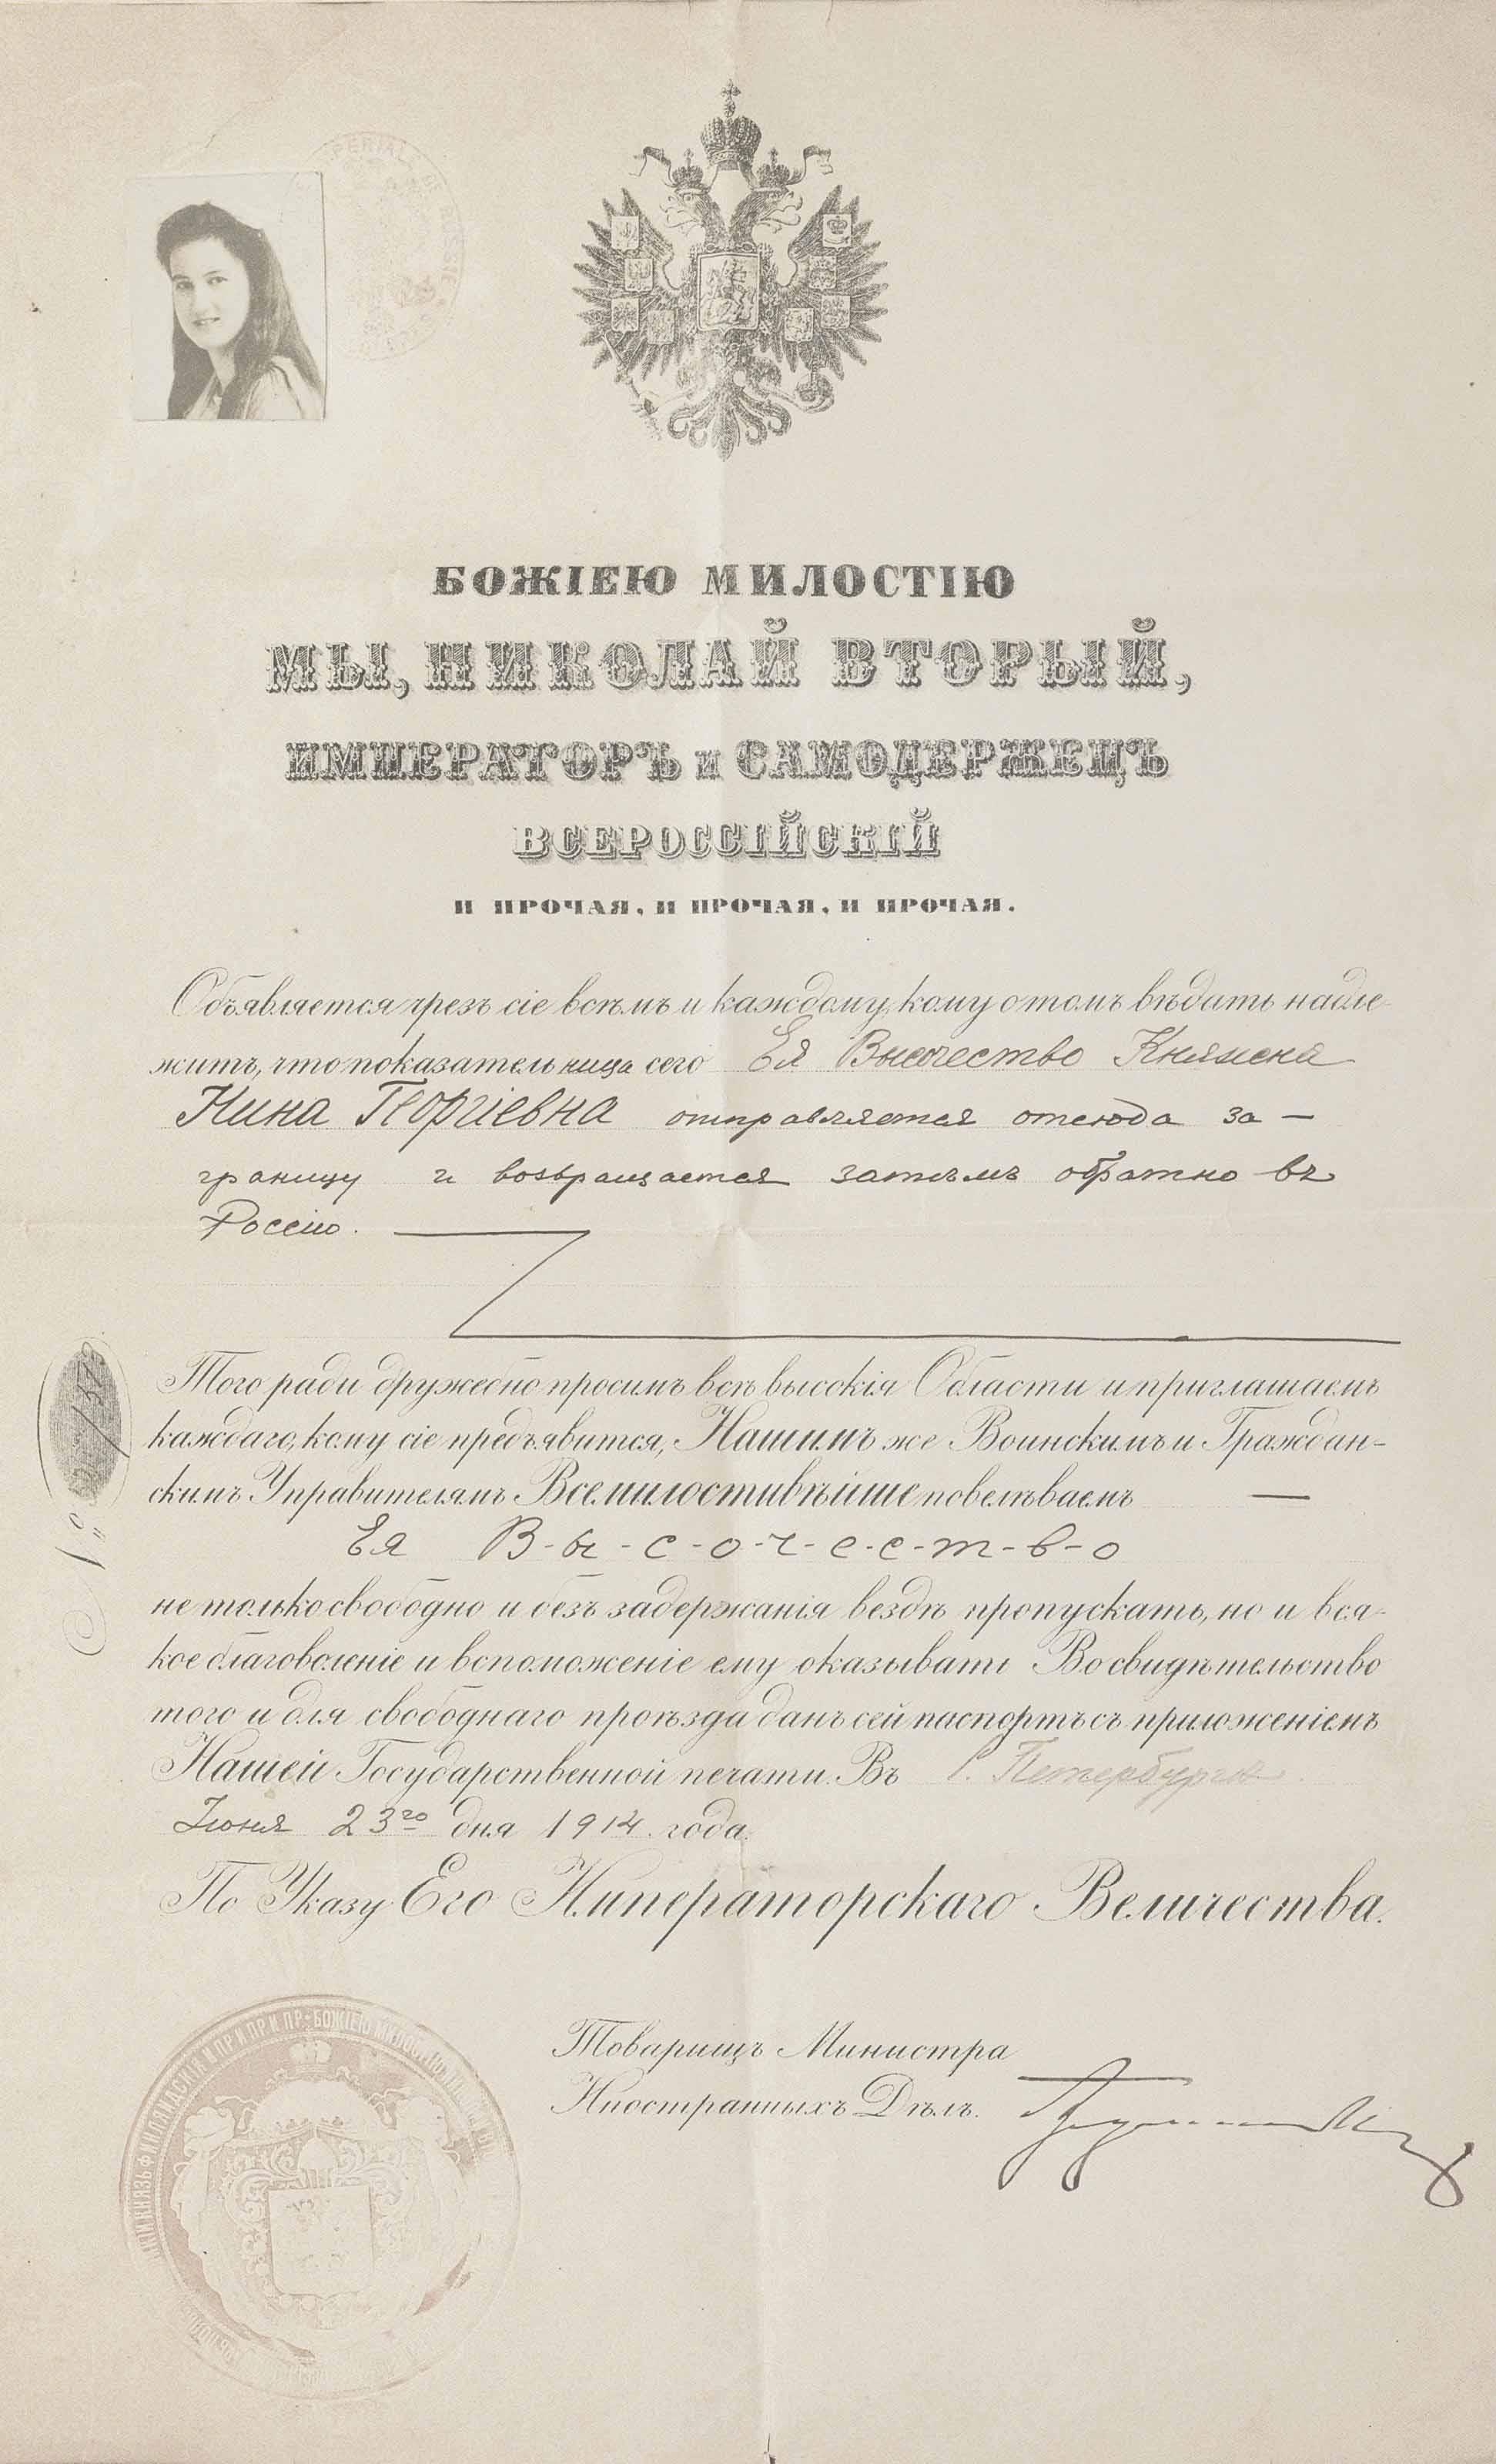 PRINCESS NINA GEORGIEVNA: A RUSSIAN PASSPORT